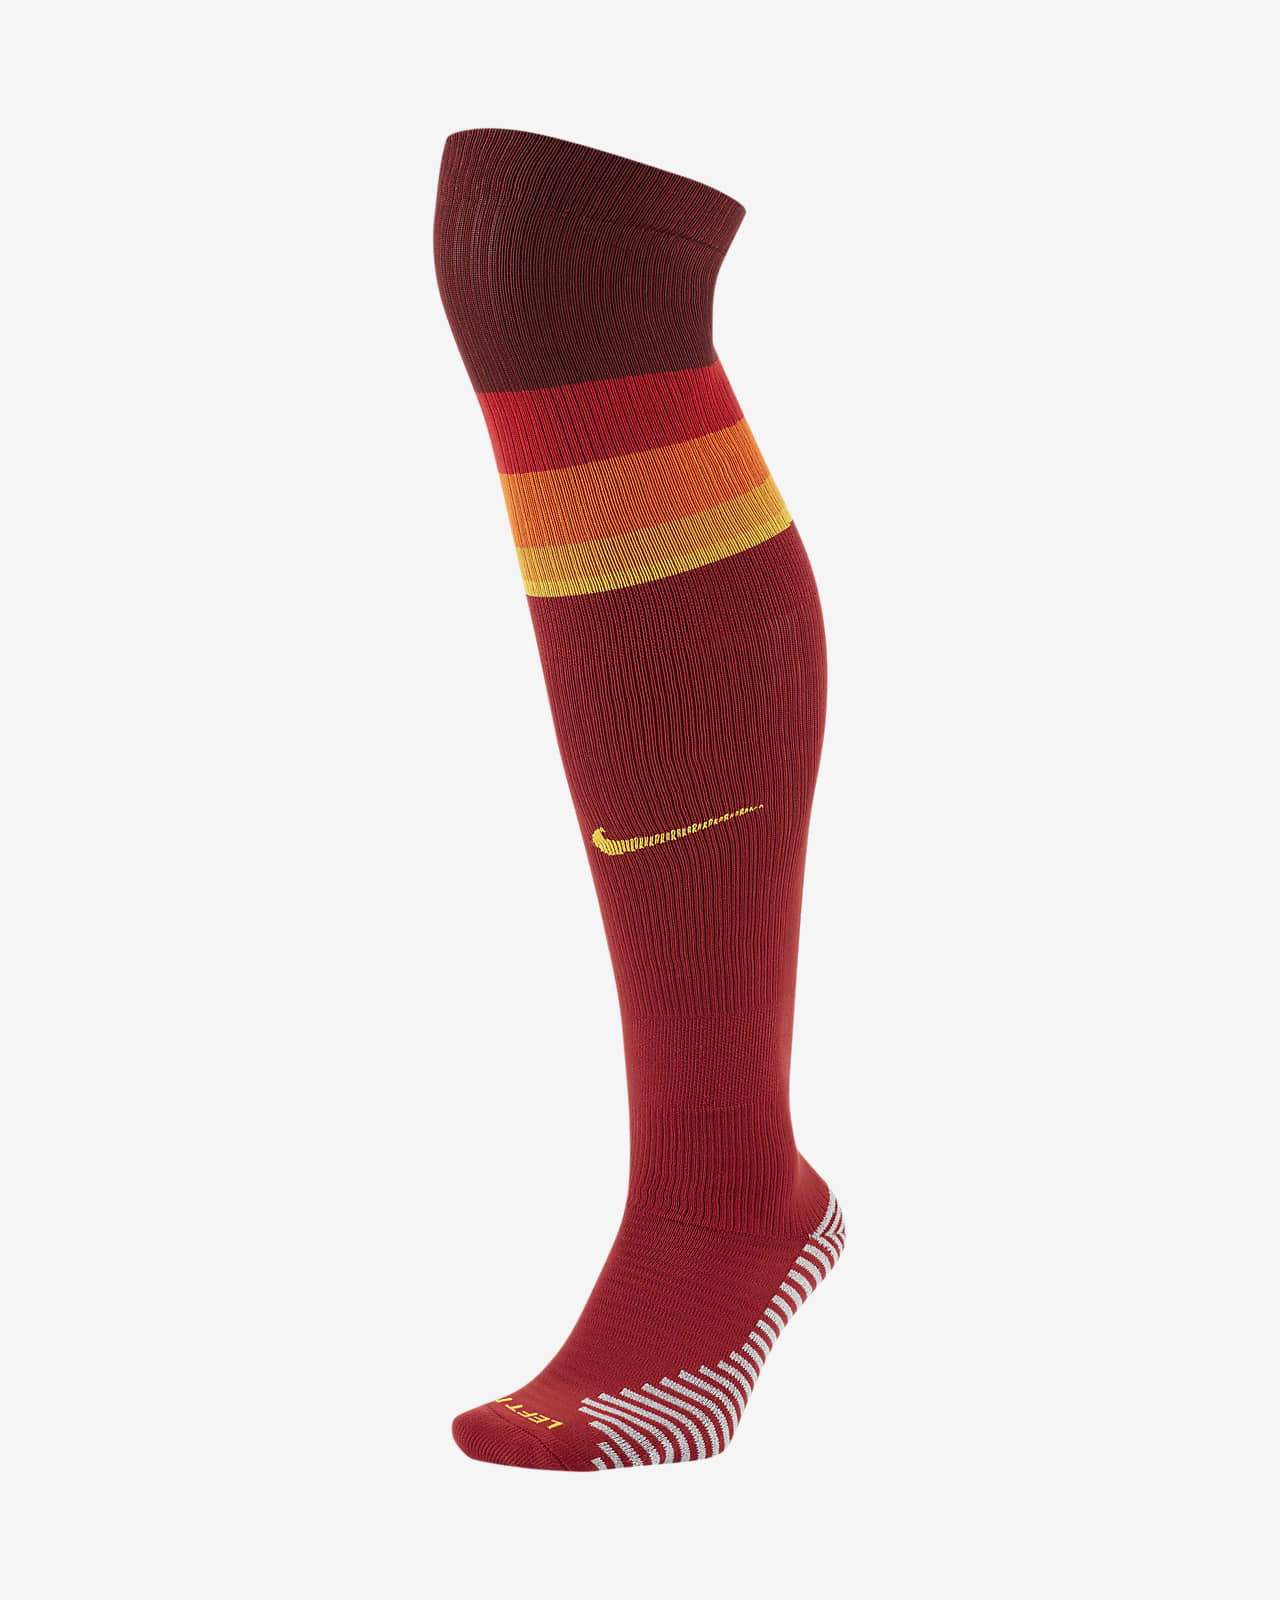 AS Roma 2020/21 Stadium Home Football Over-the-Calf Socks